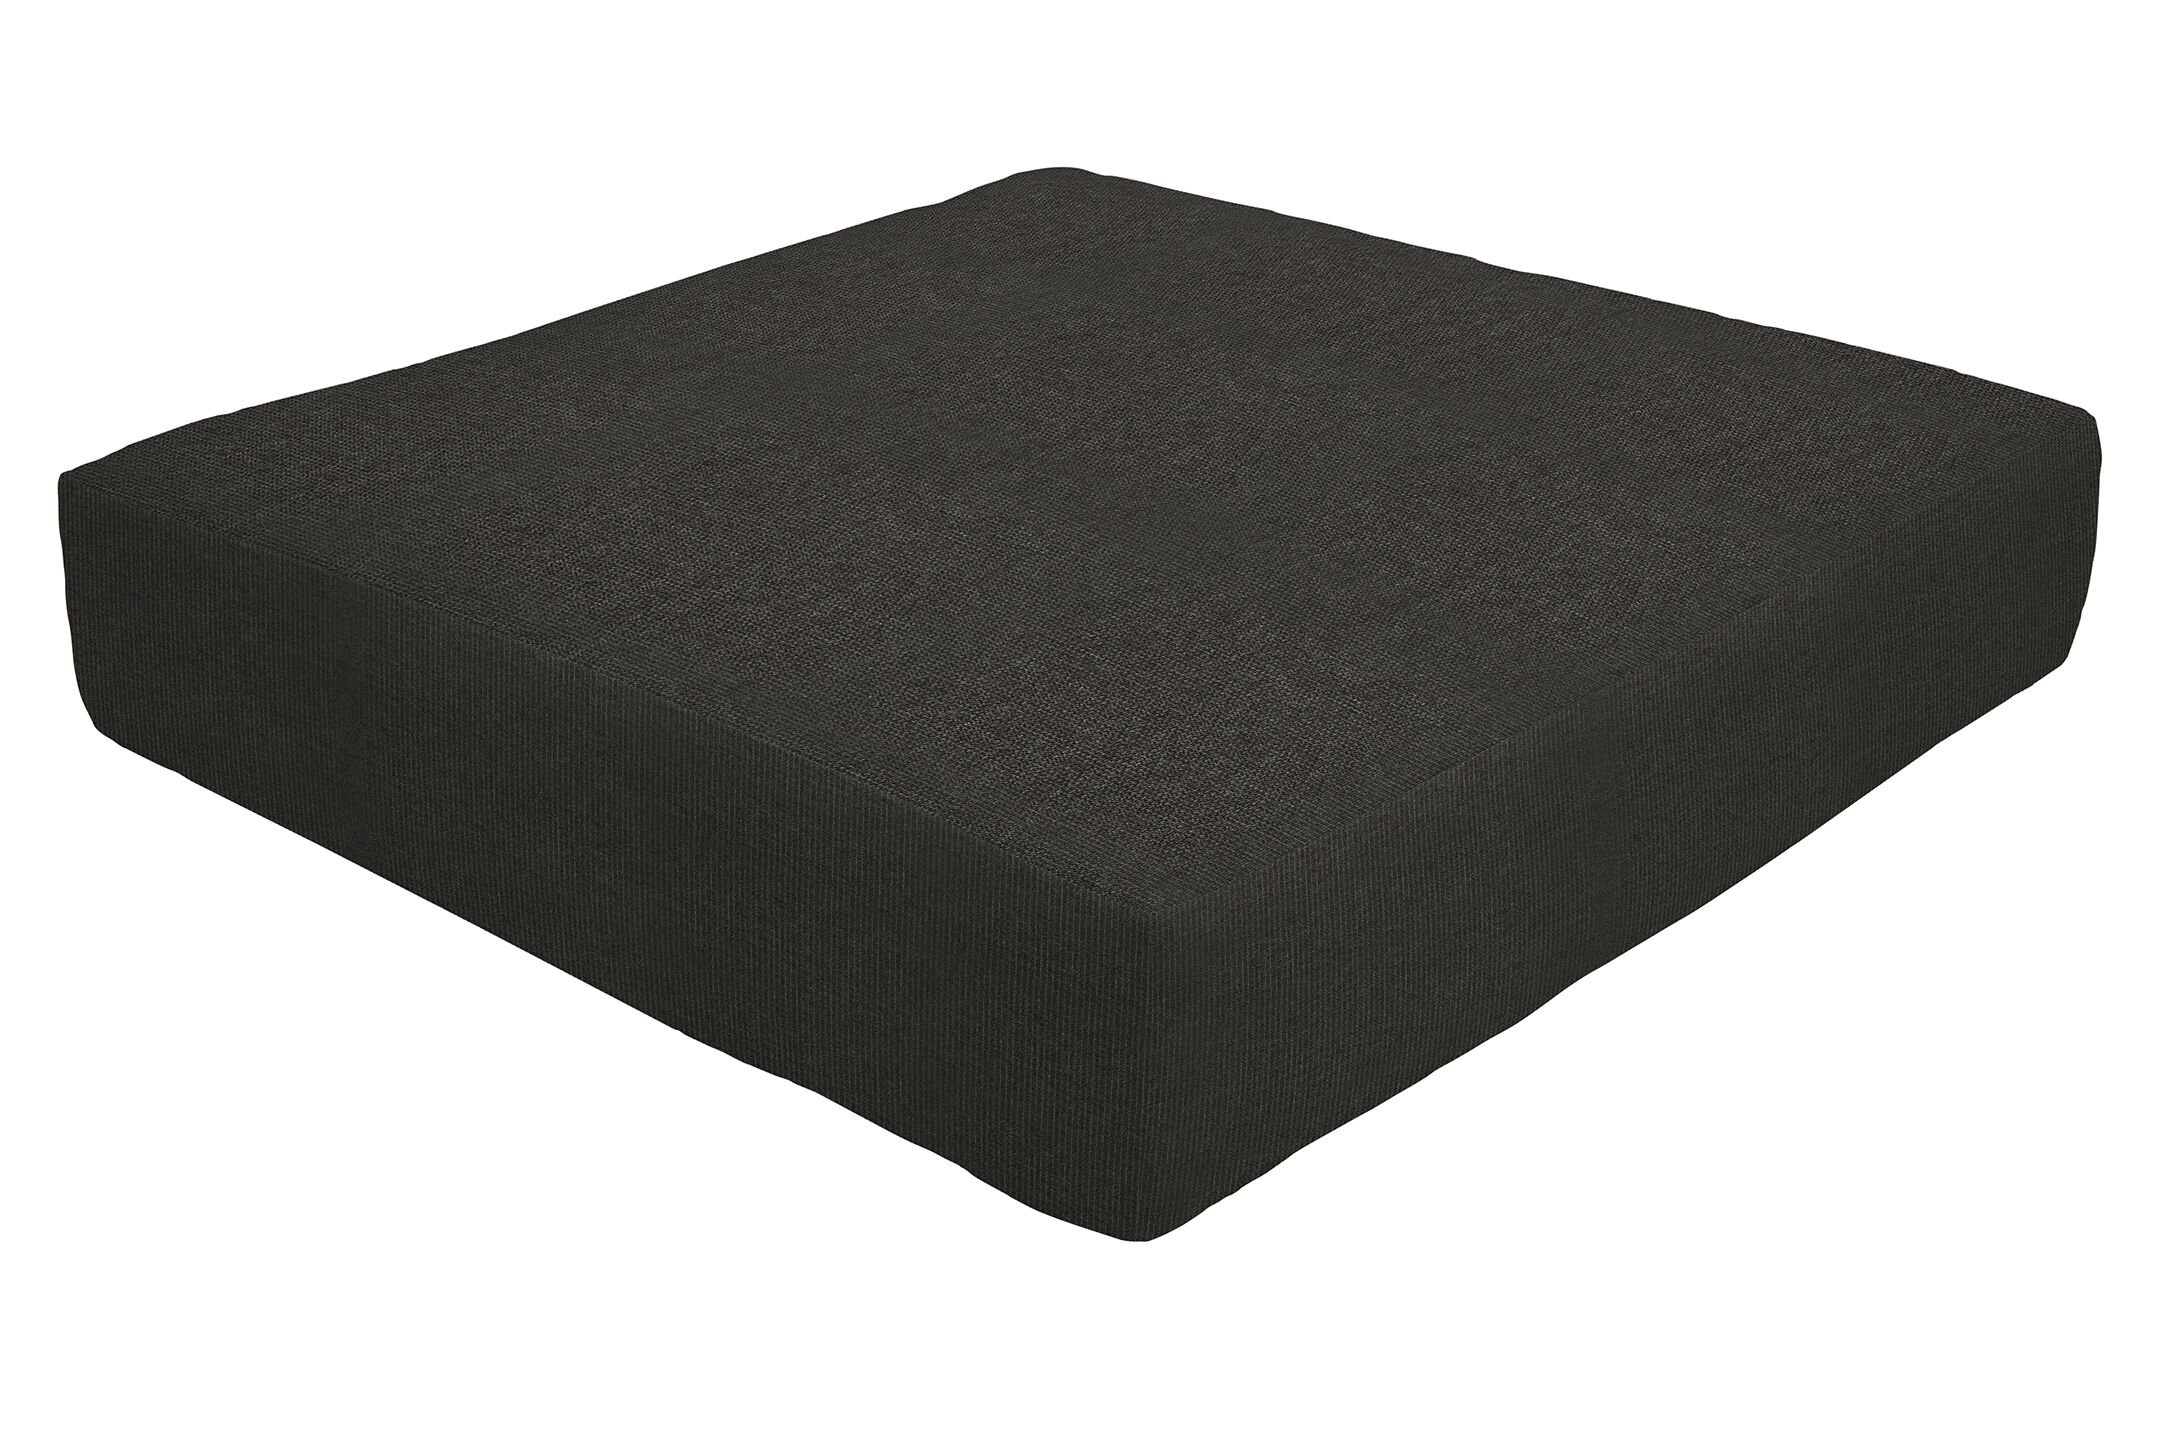 Knife Edge Indoor/Outdoor Sunbrella Ottoman Cushion Fabric: Carbon, Size: 5